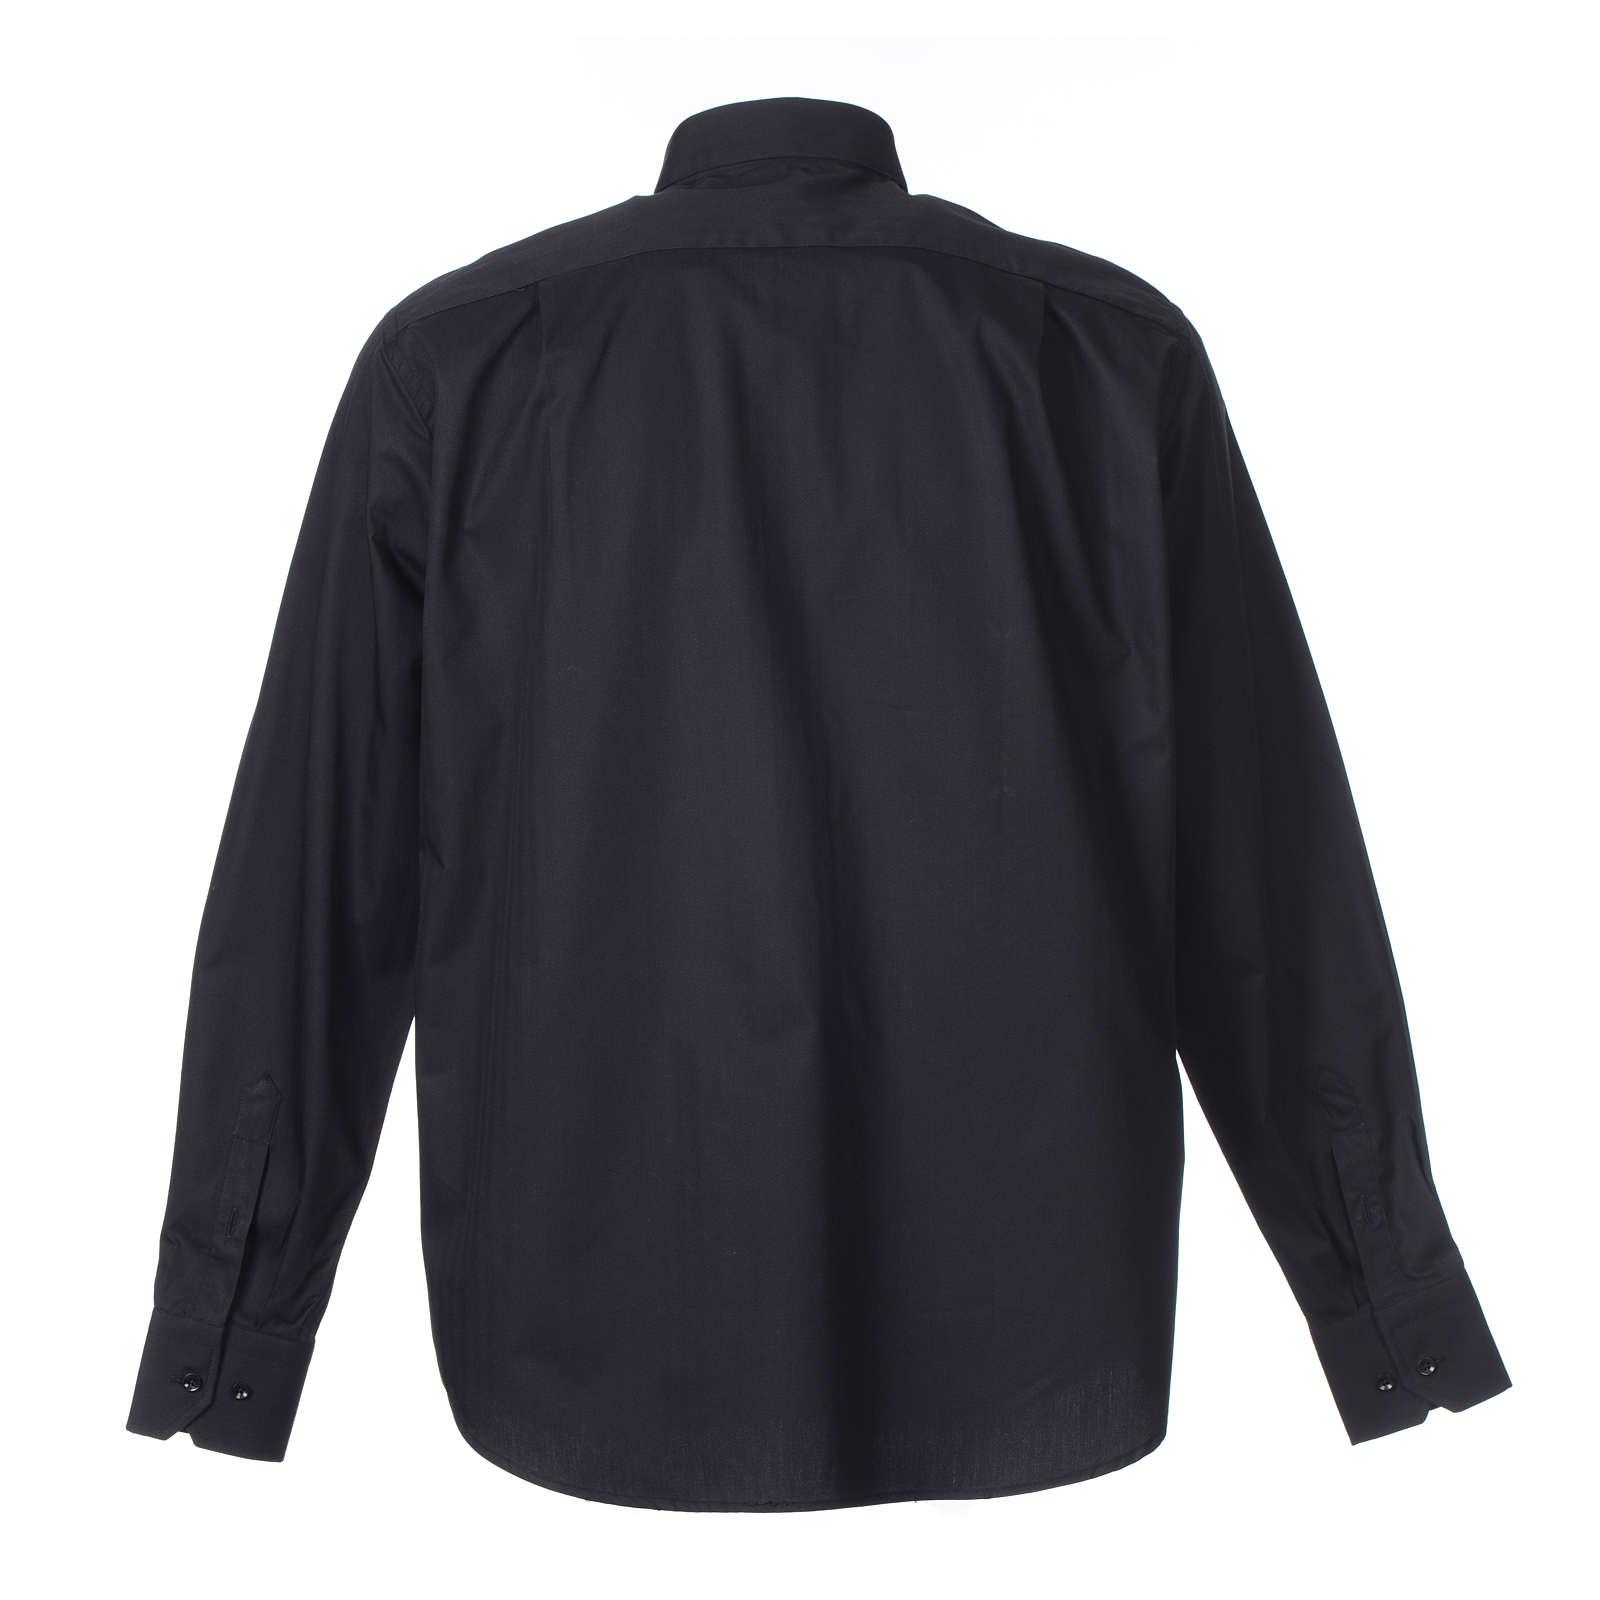 Camisa Clergy Manga Larga Planchado Facil, Mixto Algodón Espigado Negro 4